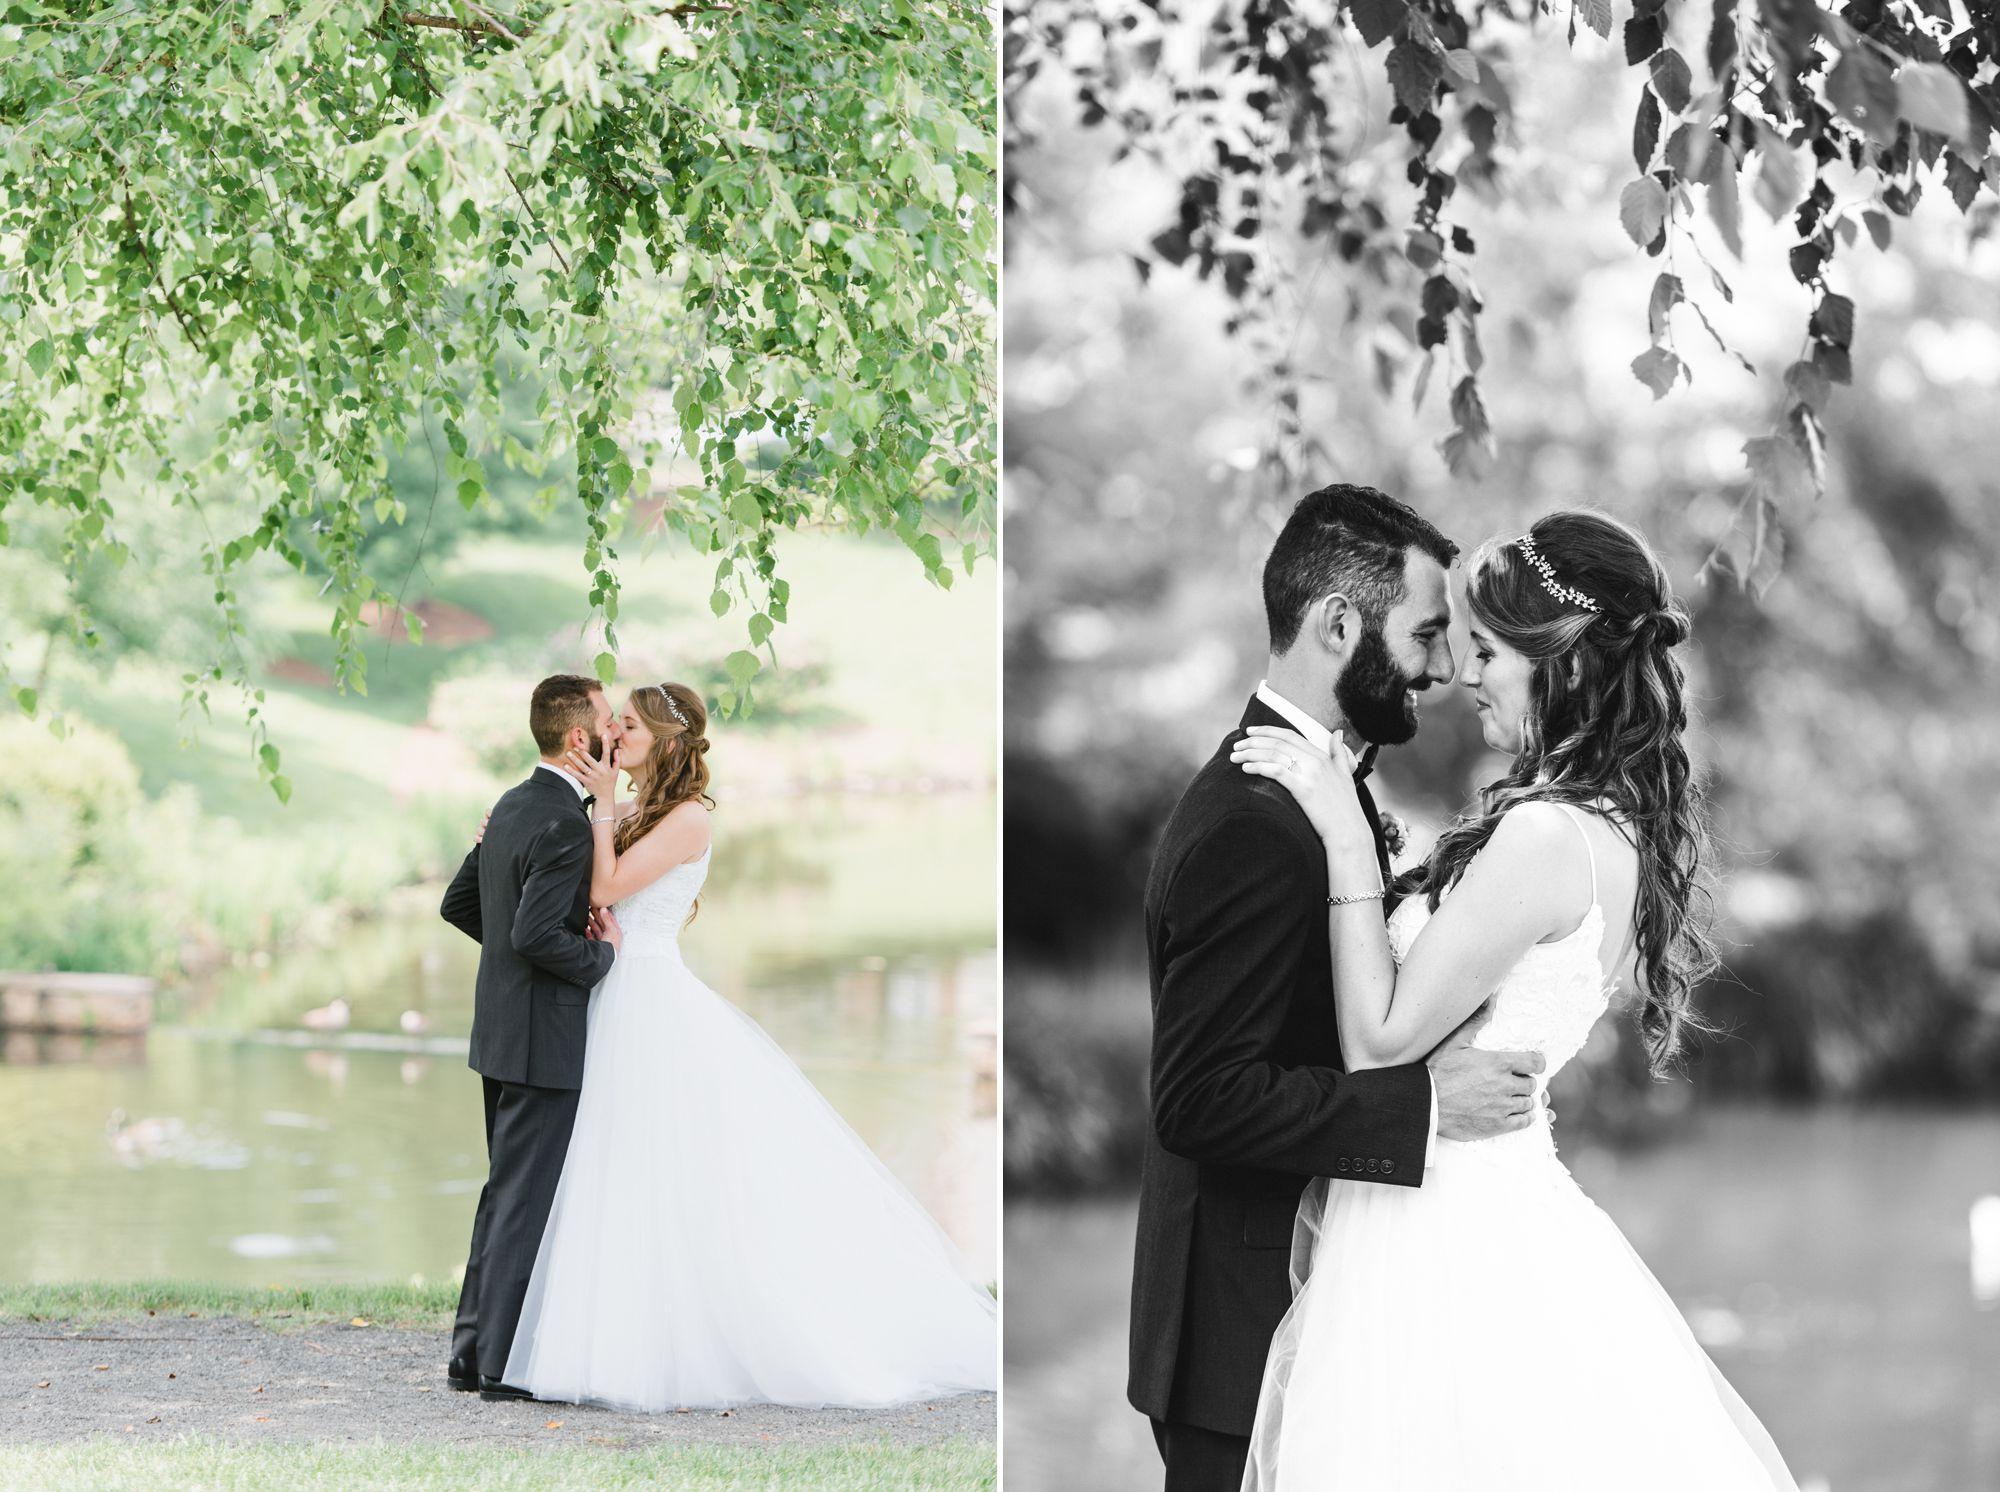 uptown-charlotte-orthodox-greek-wedding 33